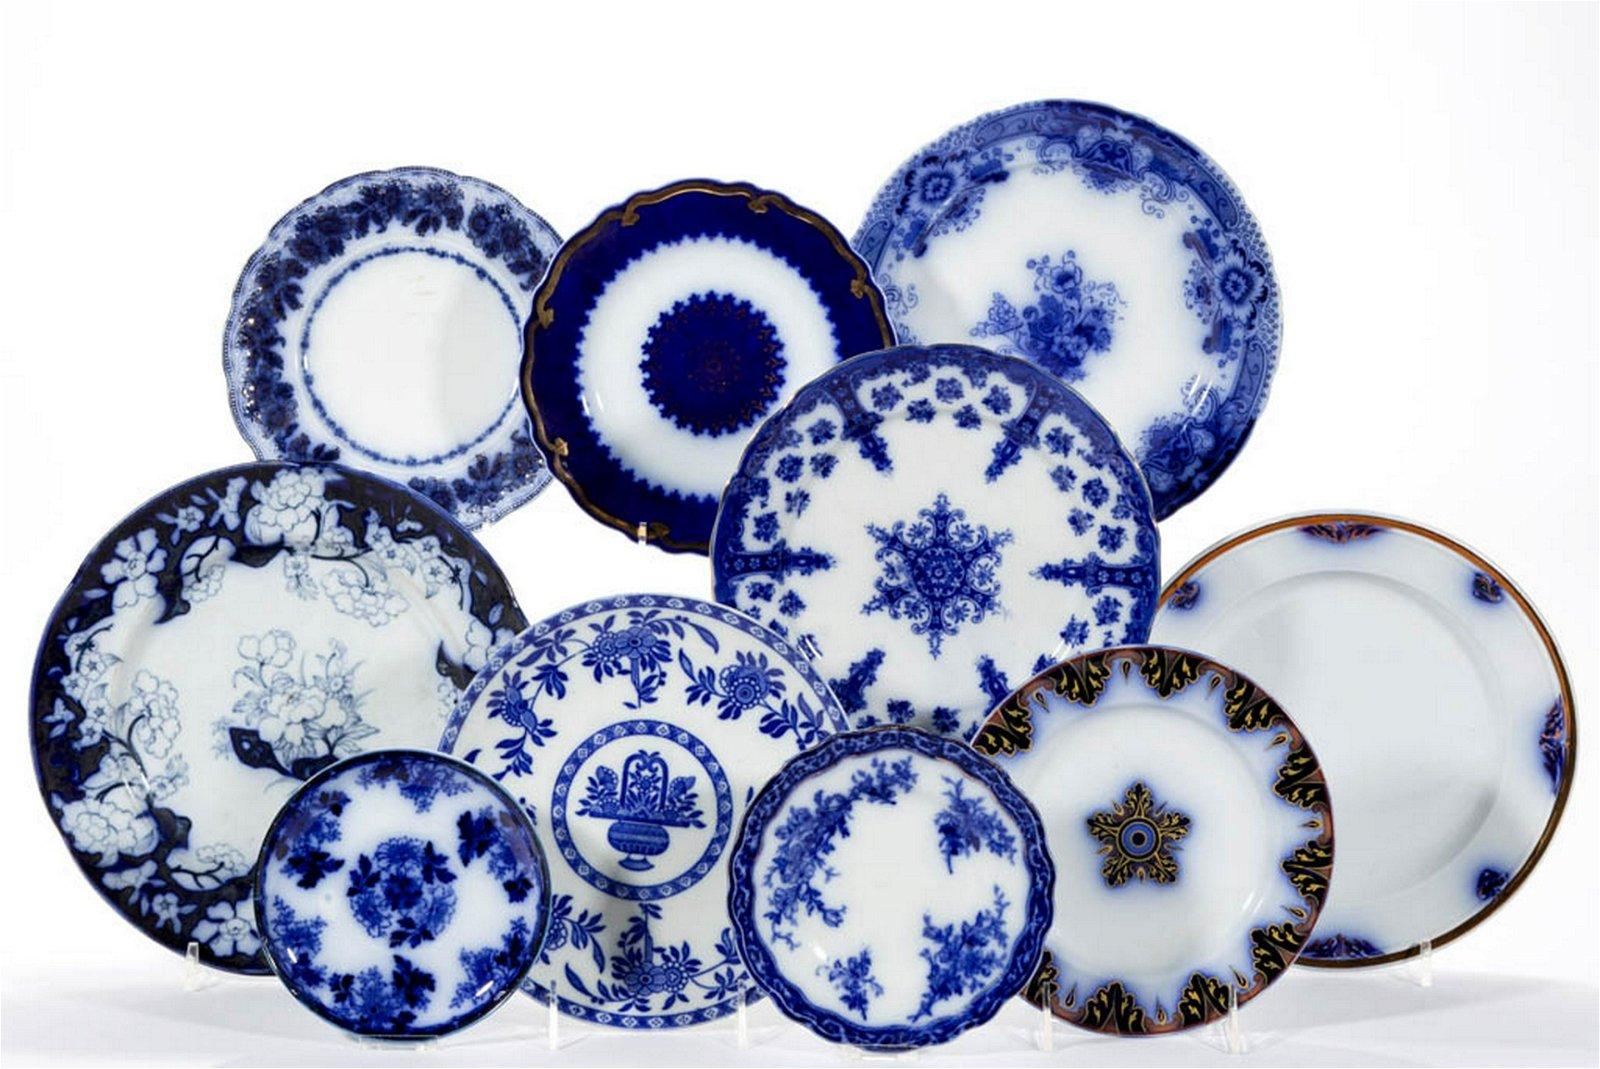 ASSORTED FLOW BLUE FLORAL MOTIF CERAMIC ARTICLES, LOT